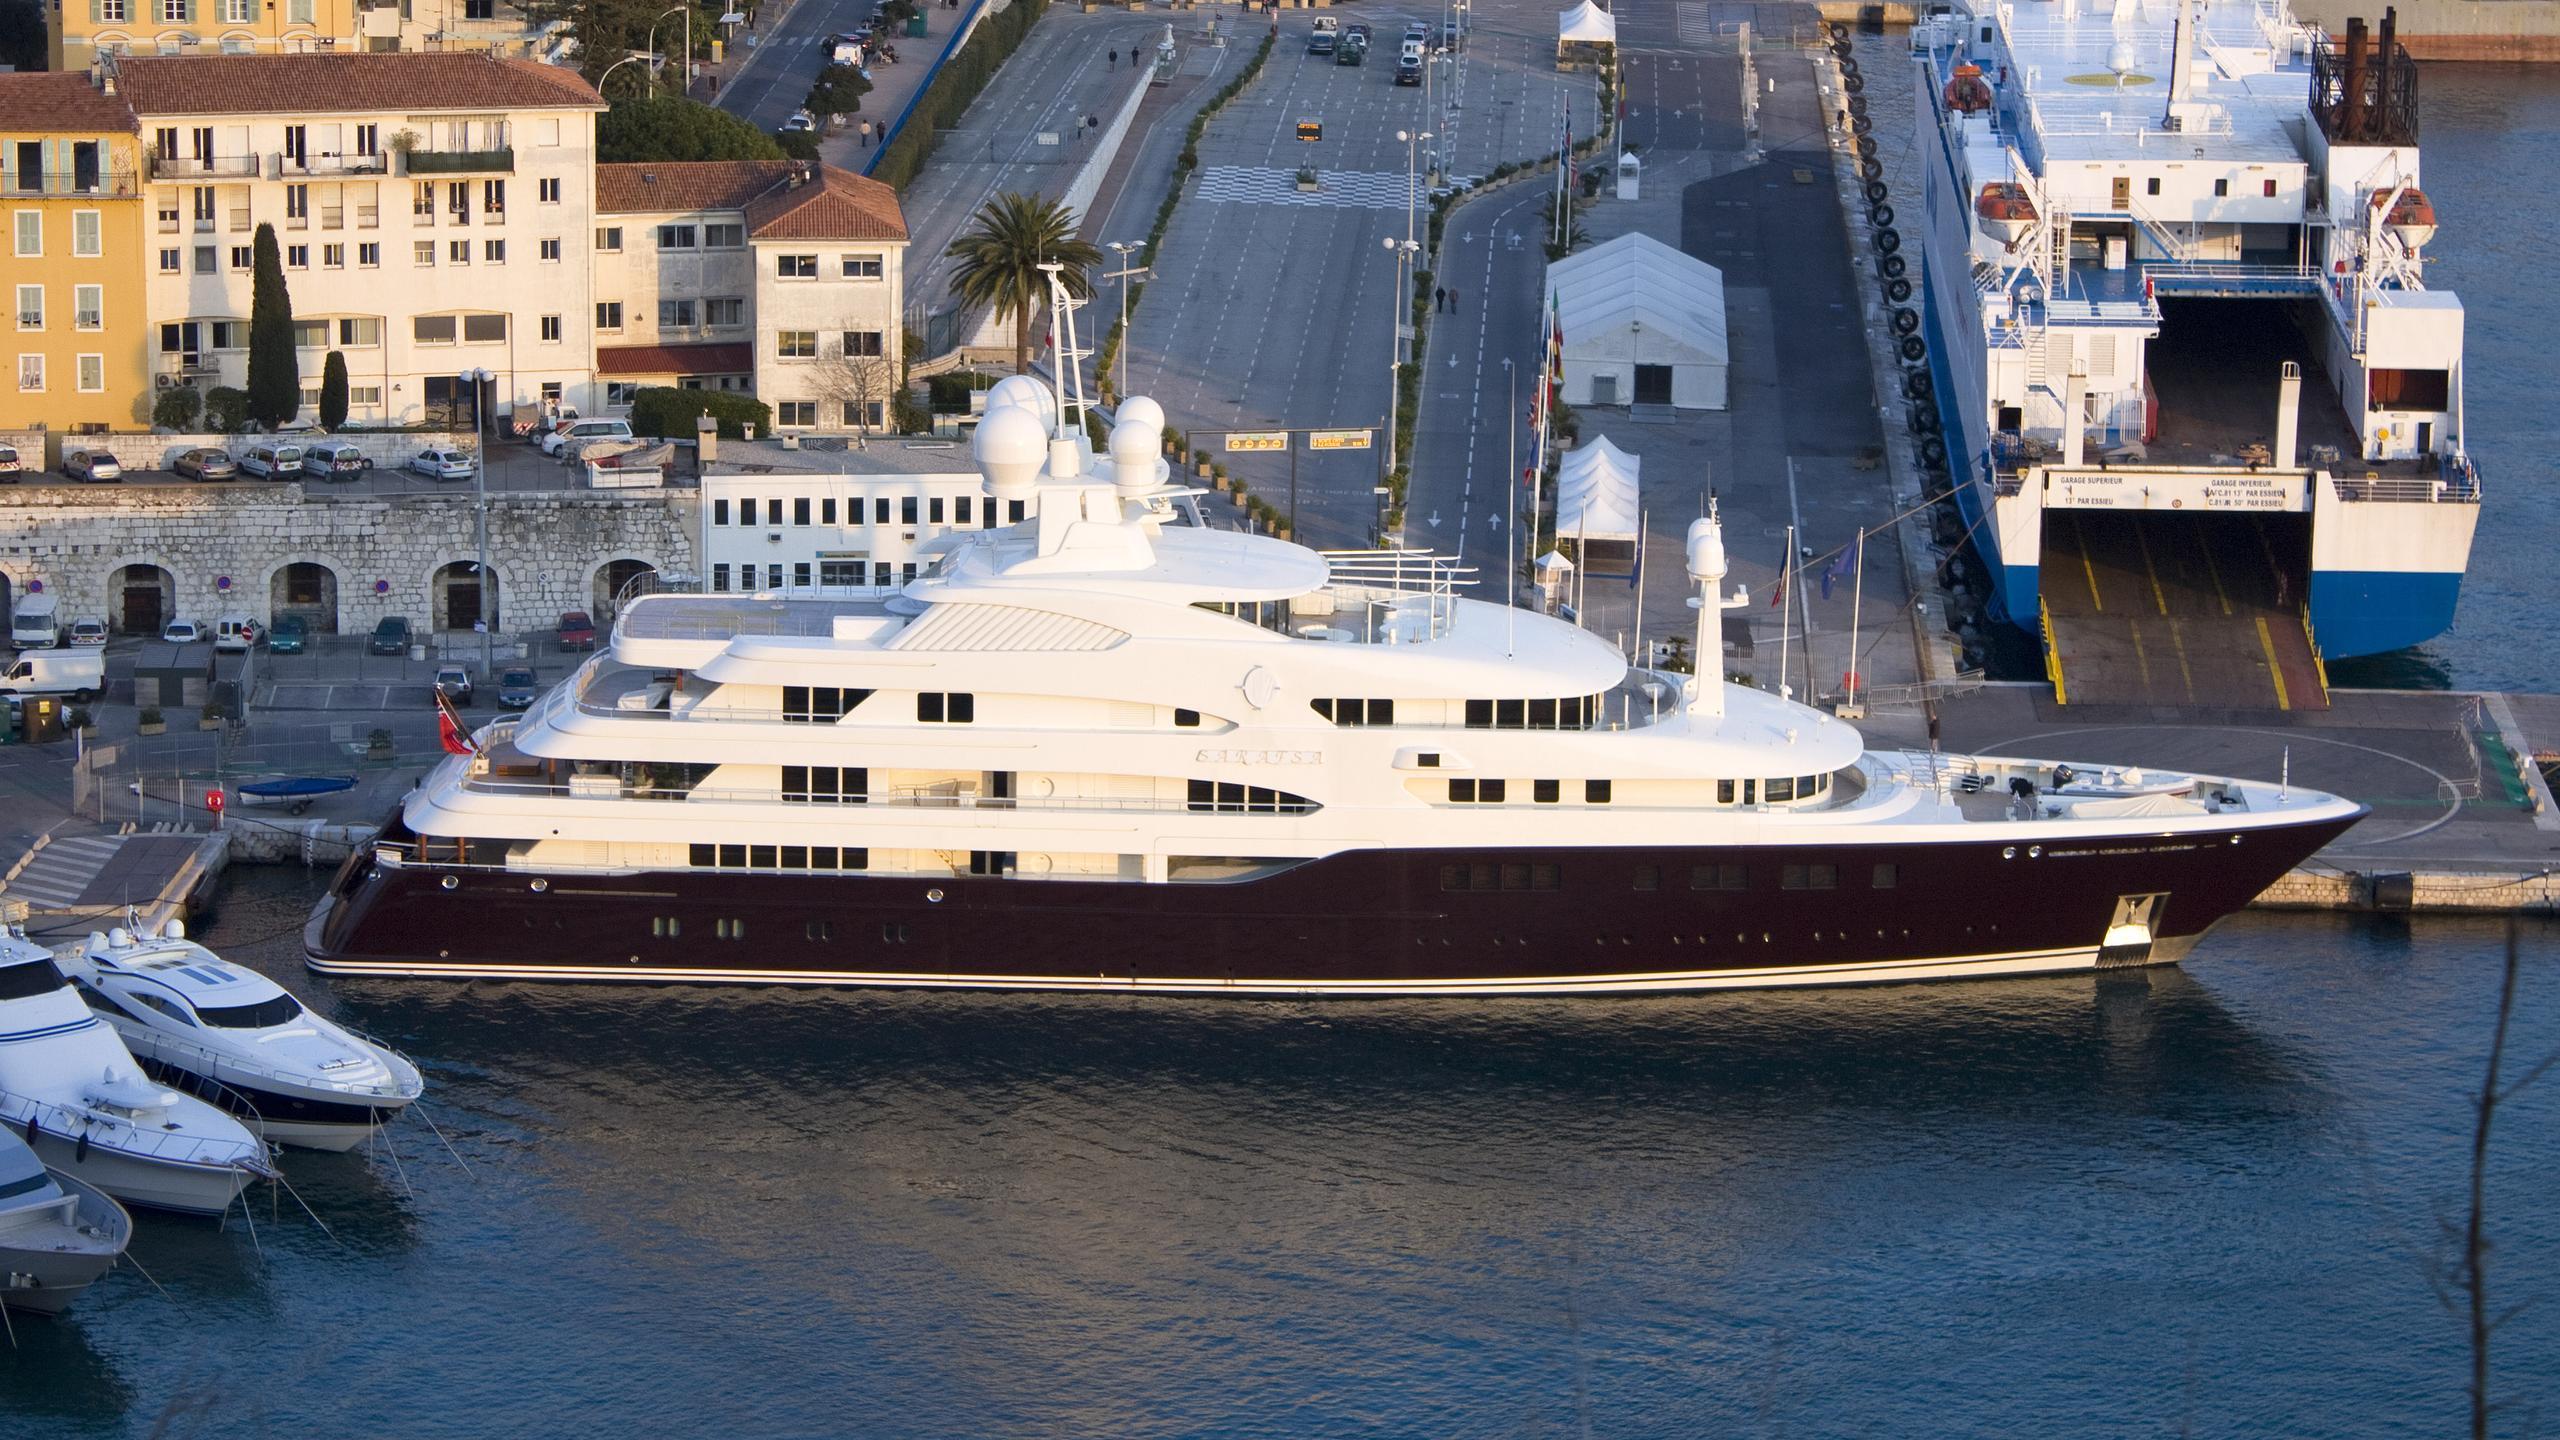 sarafsa-motor-yacht-devonport-2008-82m-profile-aerial